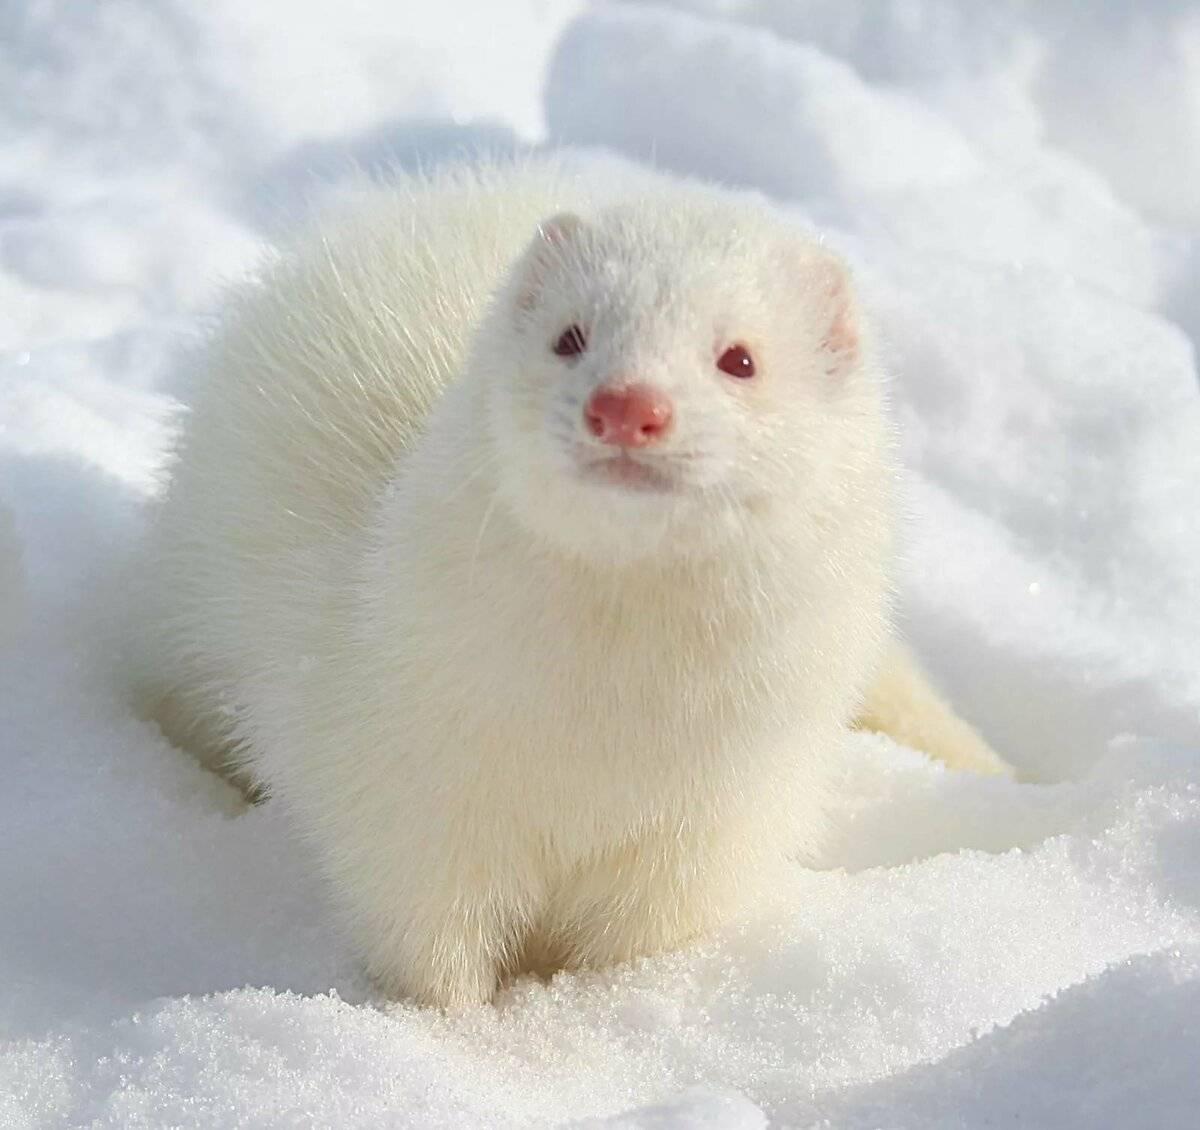 Хорек белый — описание вида, размер и характер